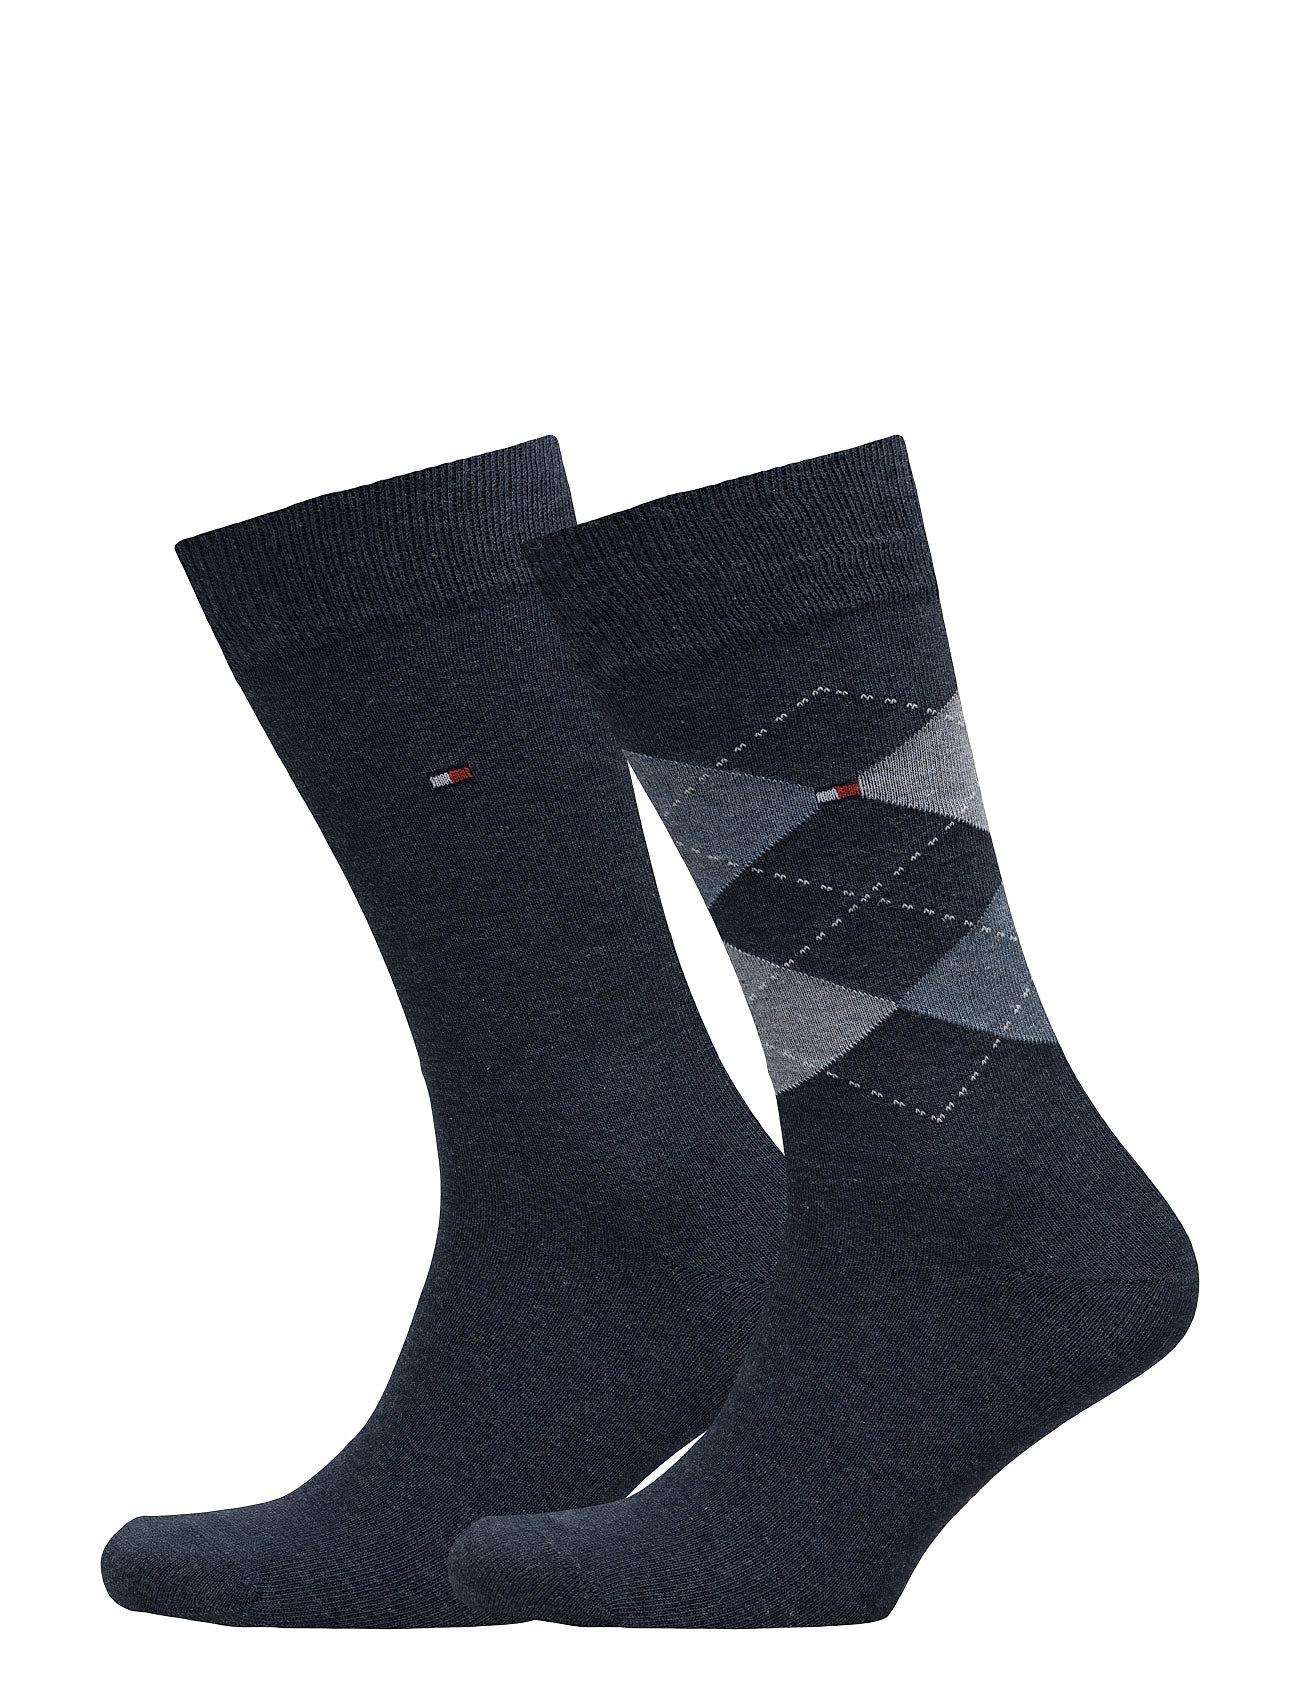 Tommy Hilfiger TH Men sock check 2-pack - JEANS